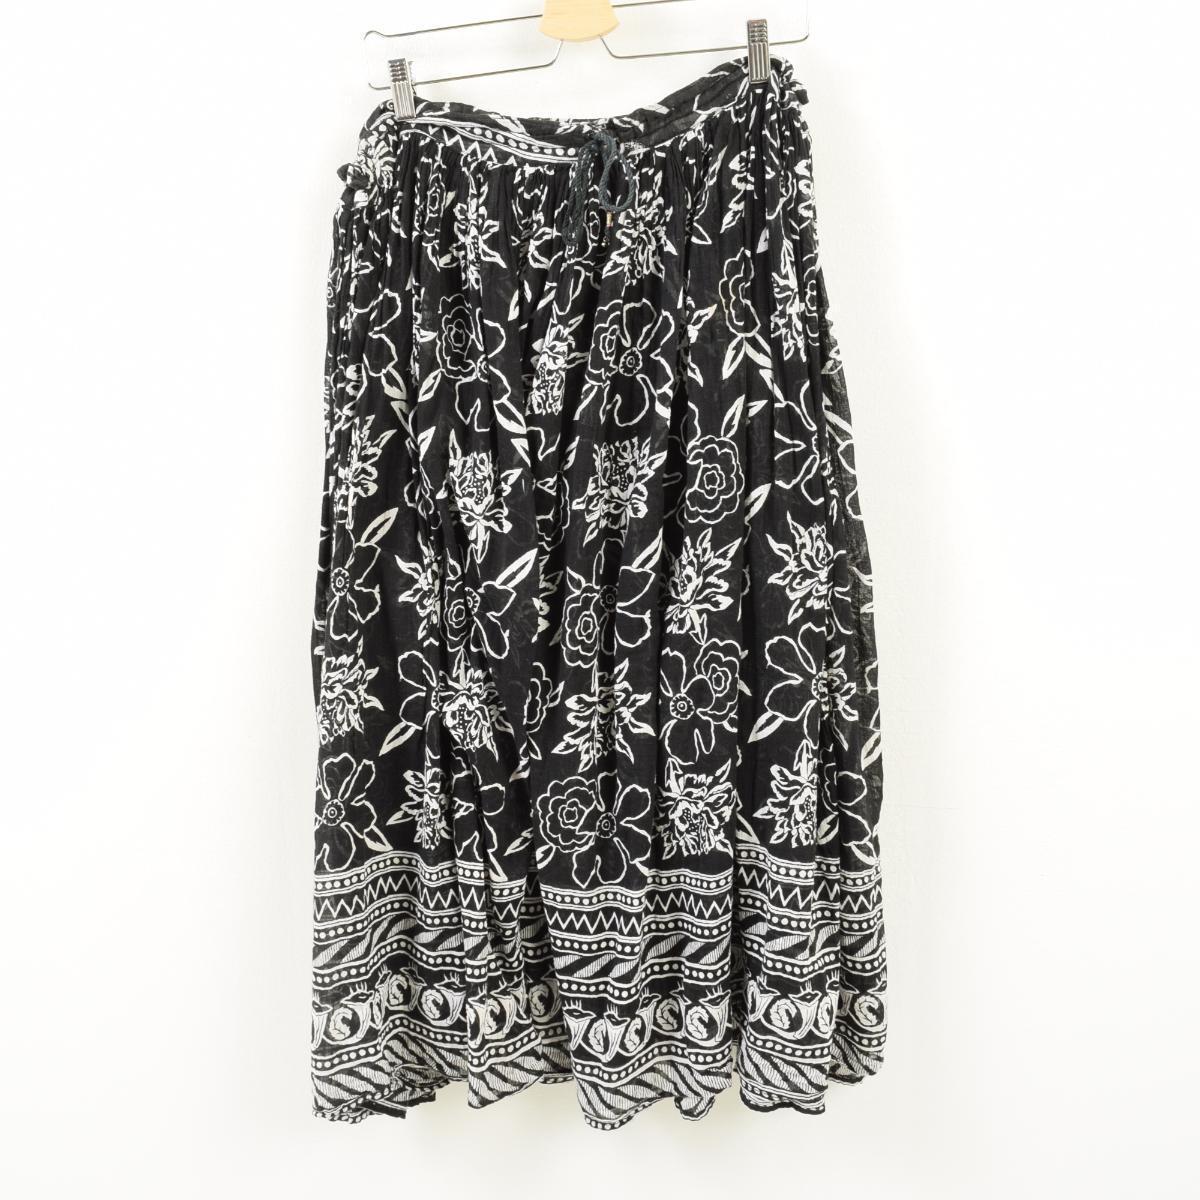 SHORT CIRCUIT India raw cotton pattern cotton long gathered skirt  adjustable size /war1732